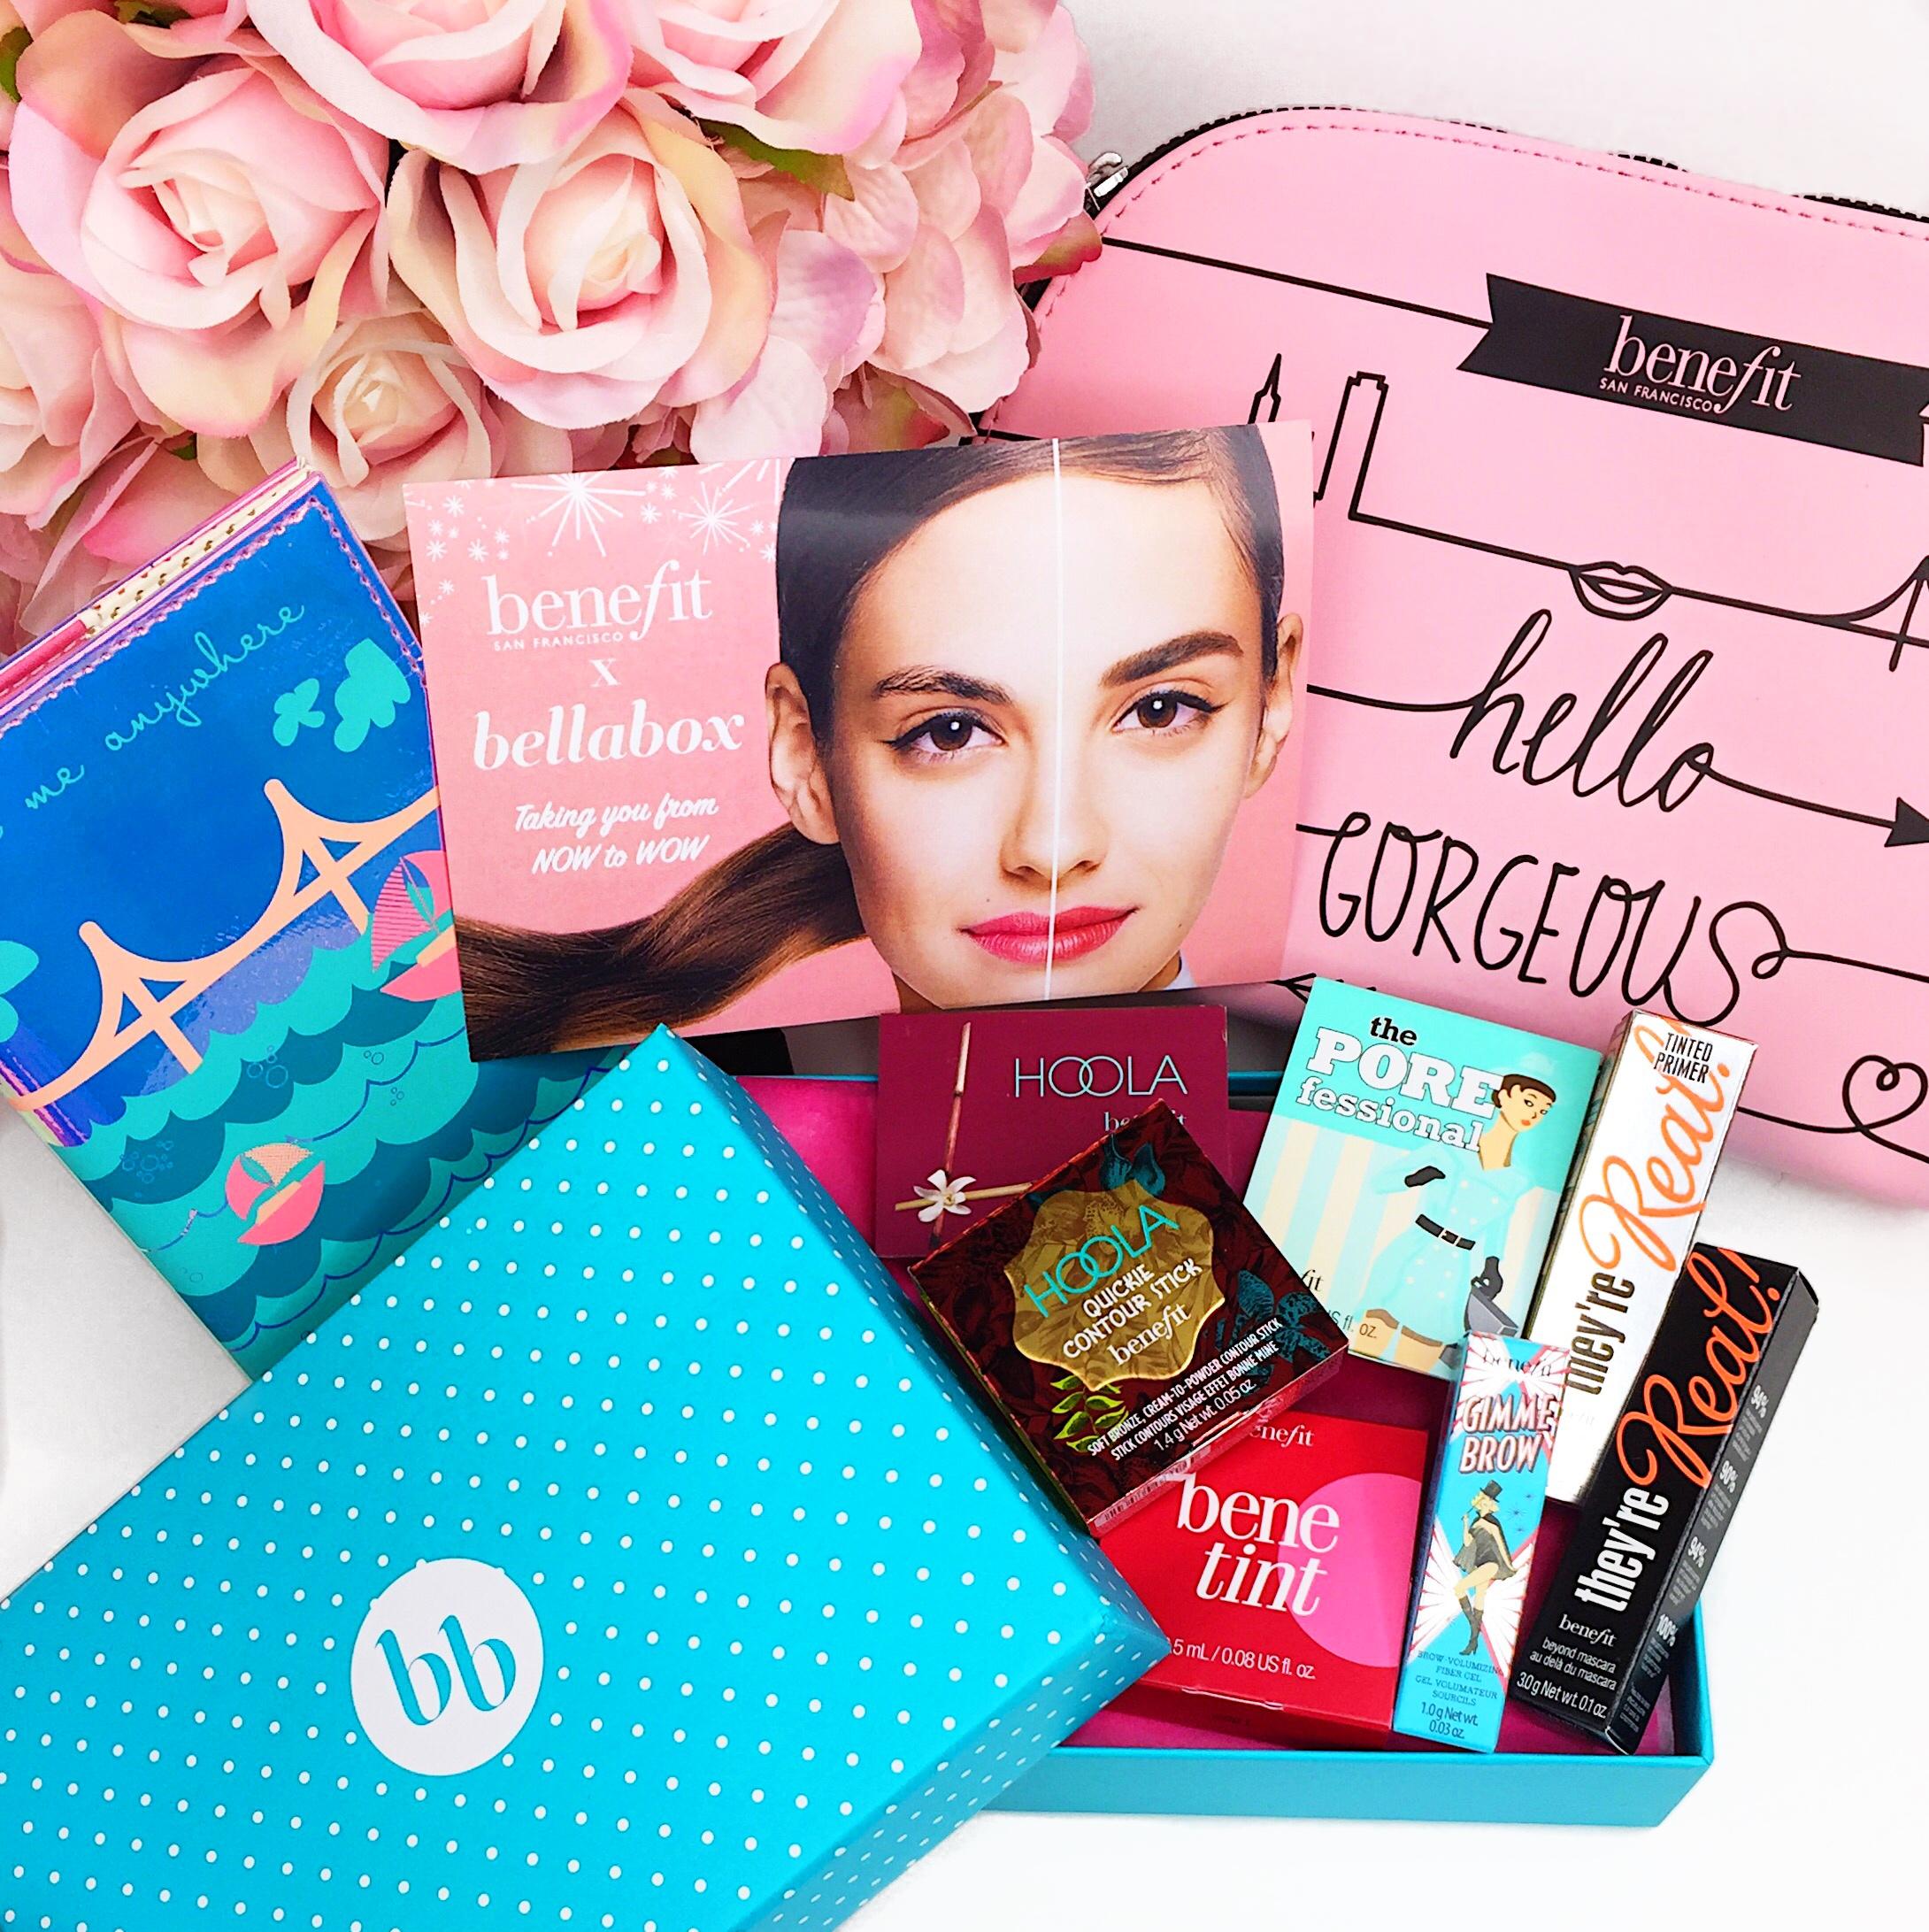 Marisa Robinson Beauty Bellabox x Benefit Cosmetics